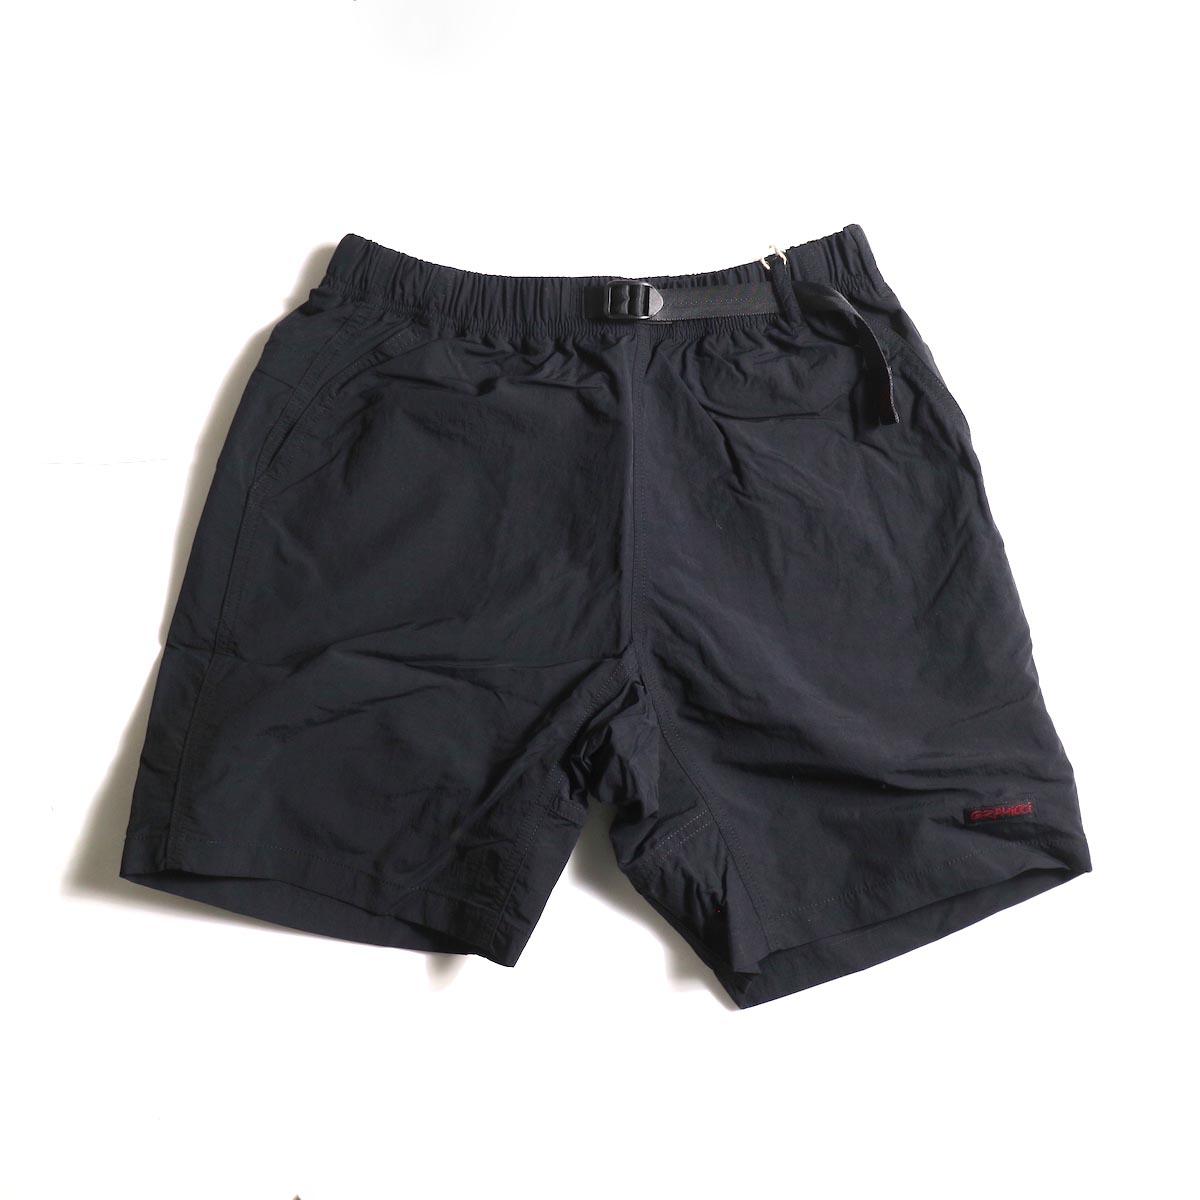 GRAMICCI / Shell Packable Shorts (Black)